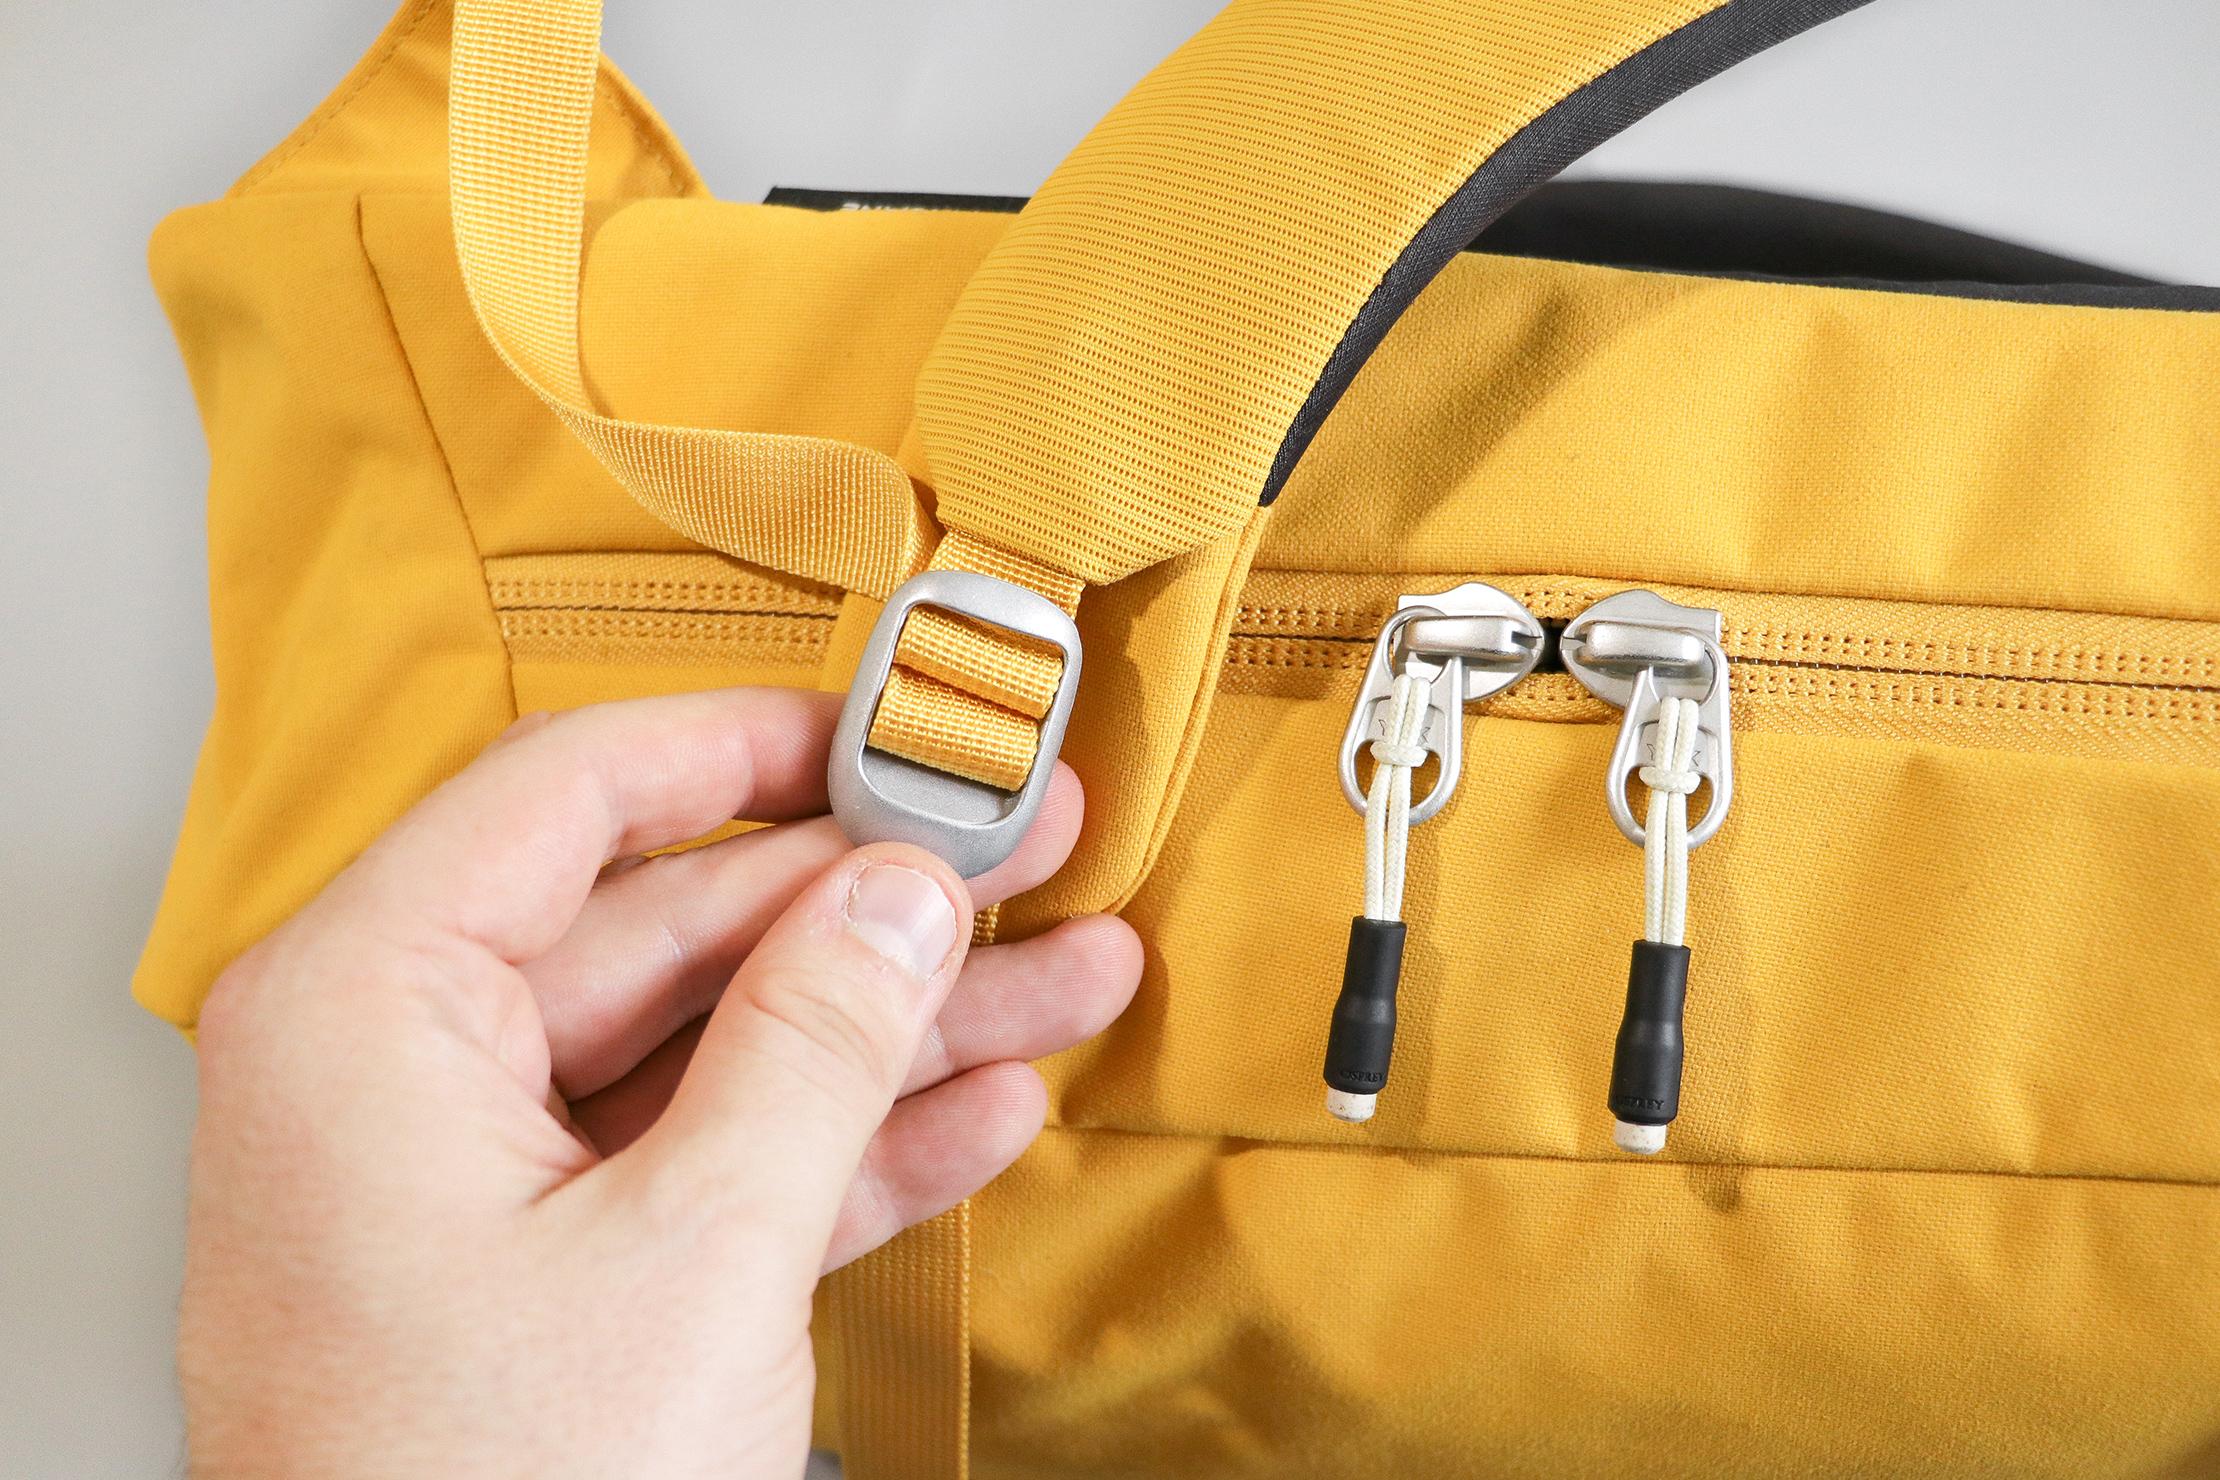 Osprey Arcane Large Day Pack (V2) Zippers and Hardware